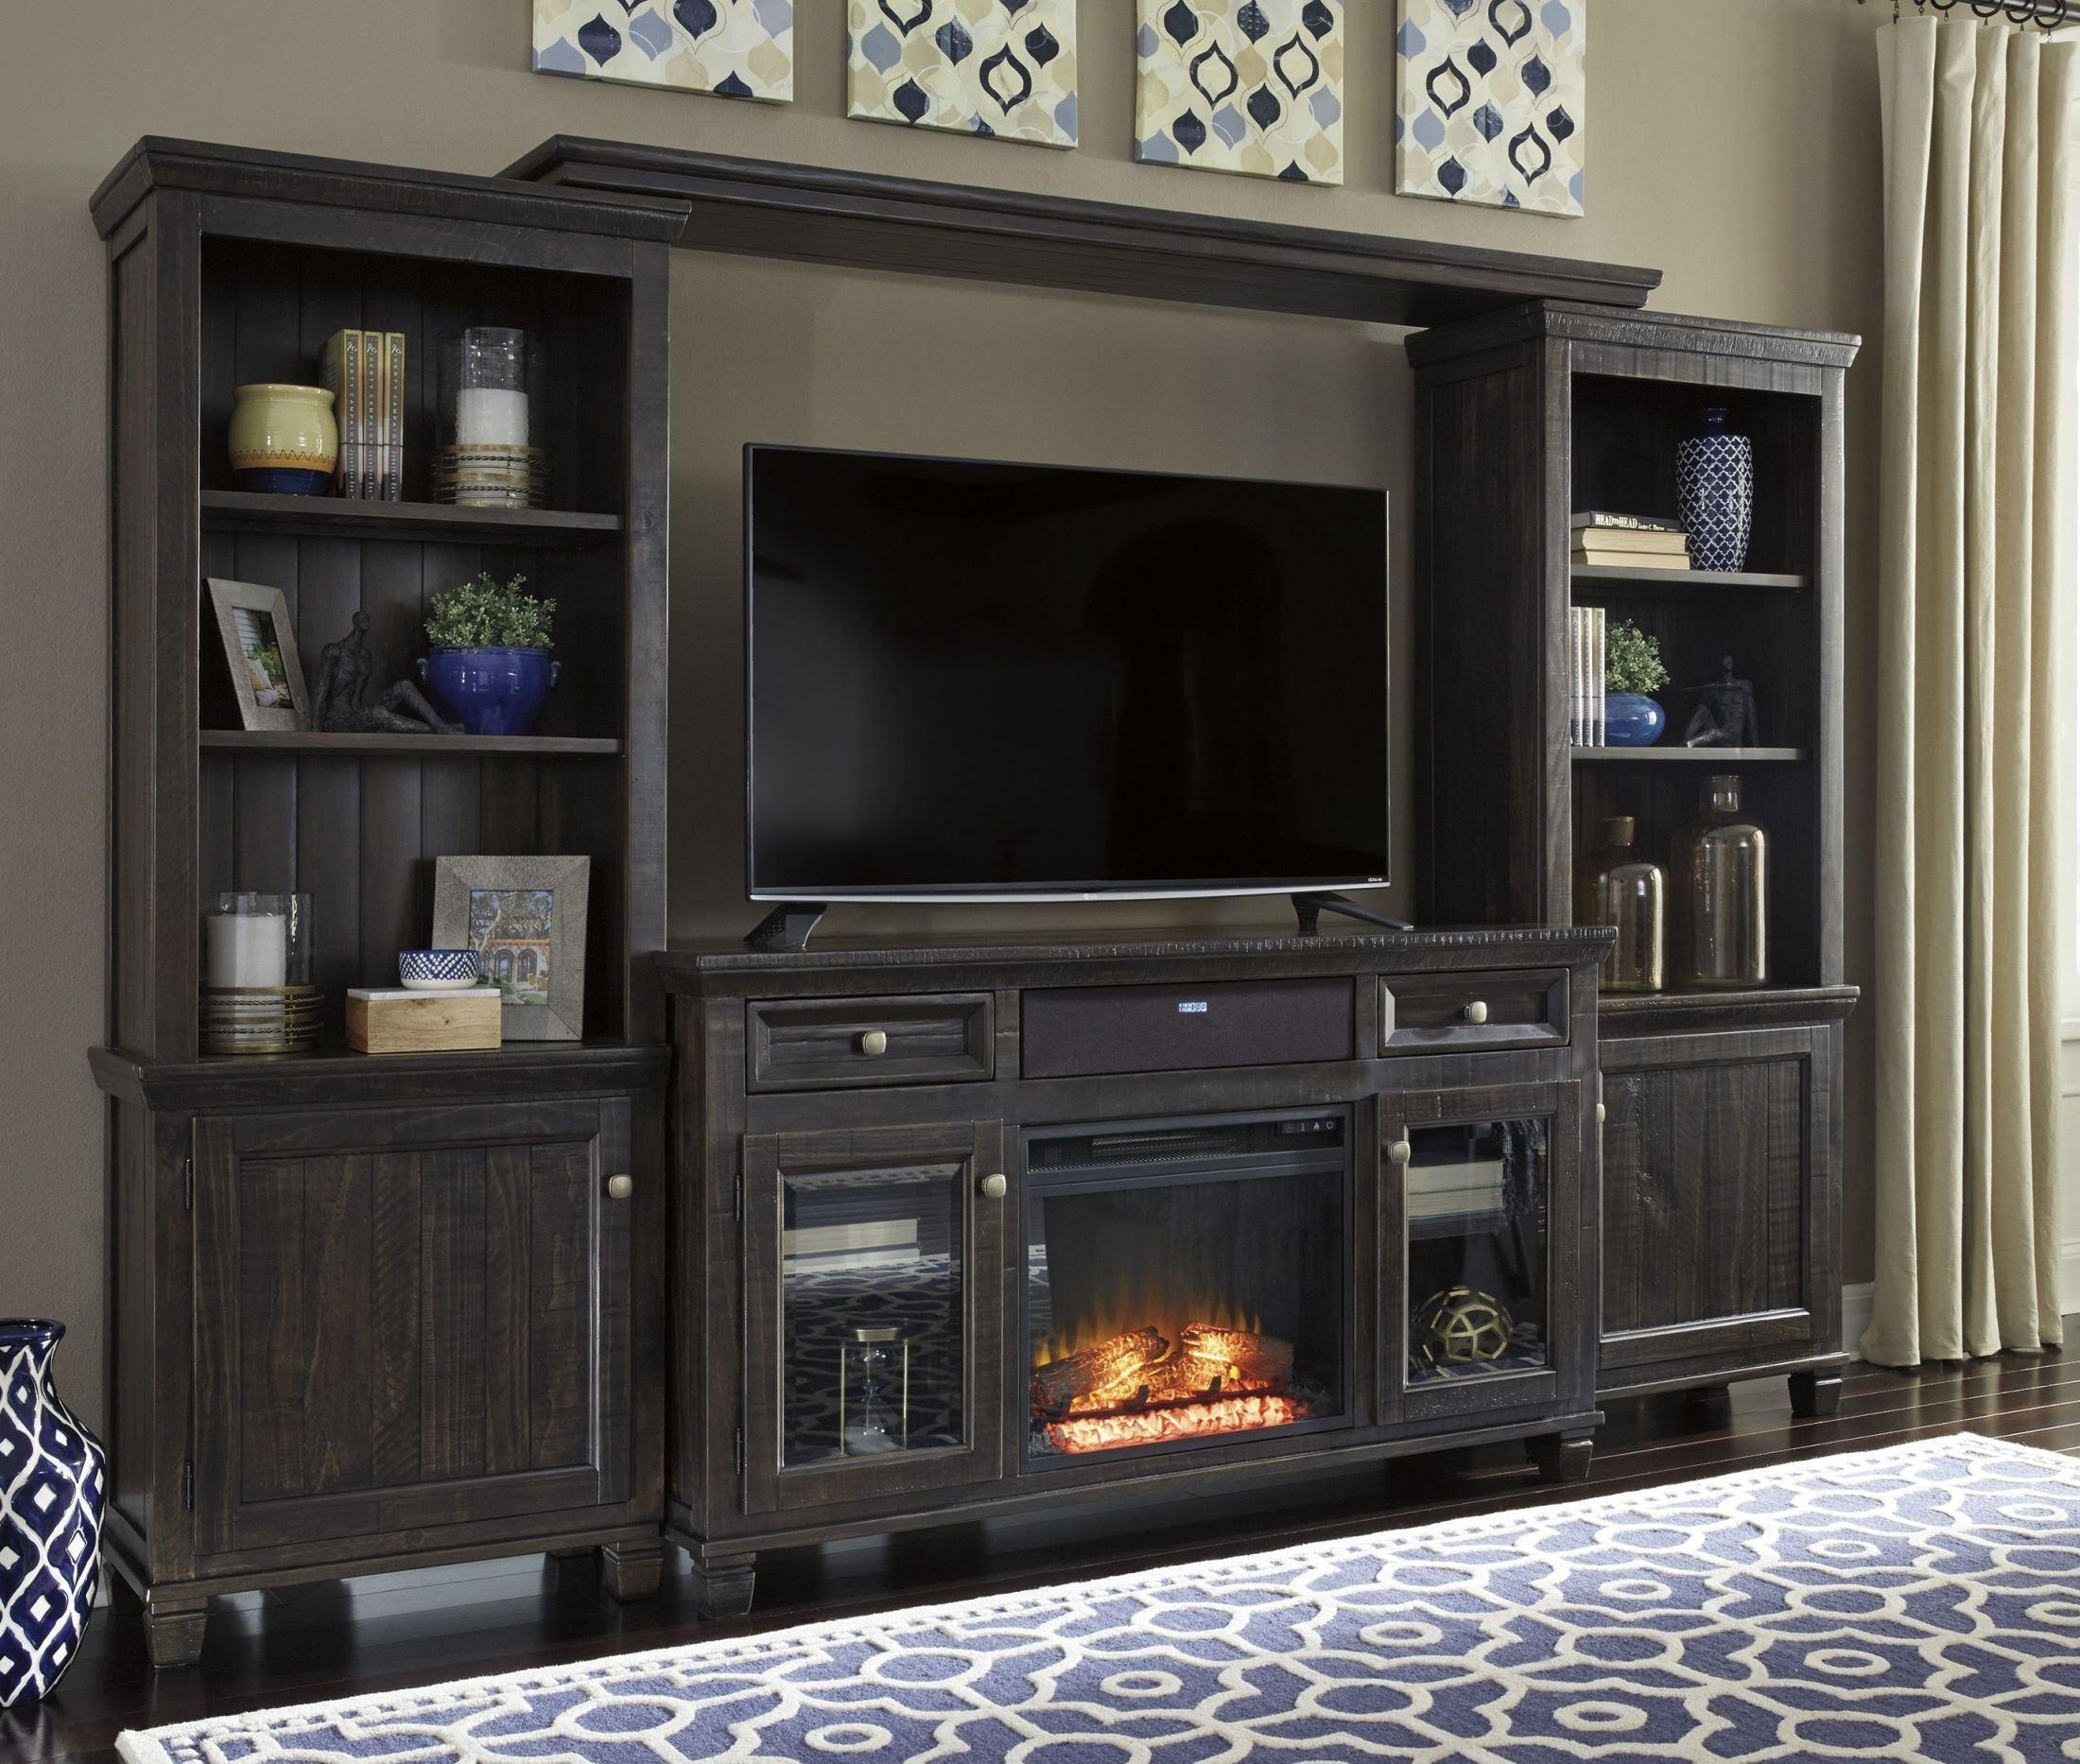 FurnitureETC | Furniture & More Townser Waxy Grayish Brown Large ...